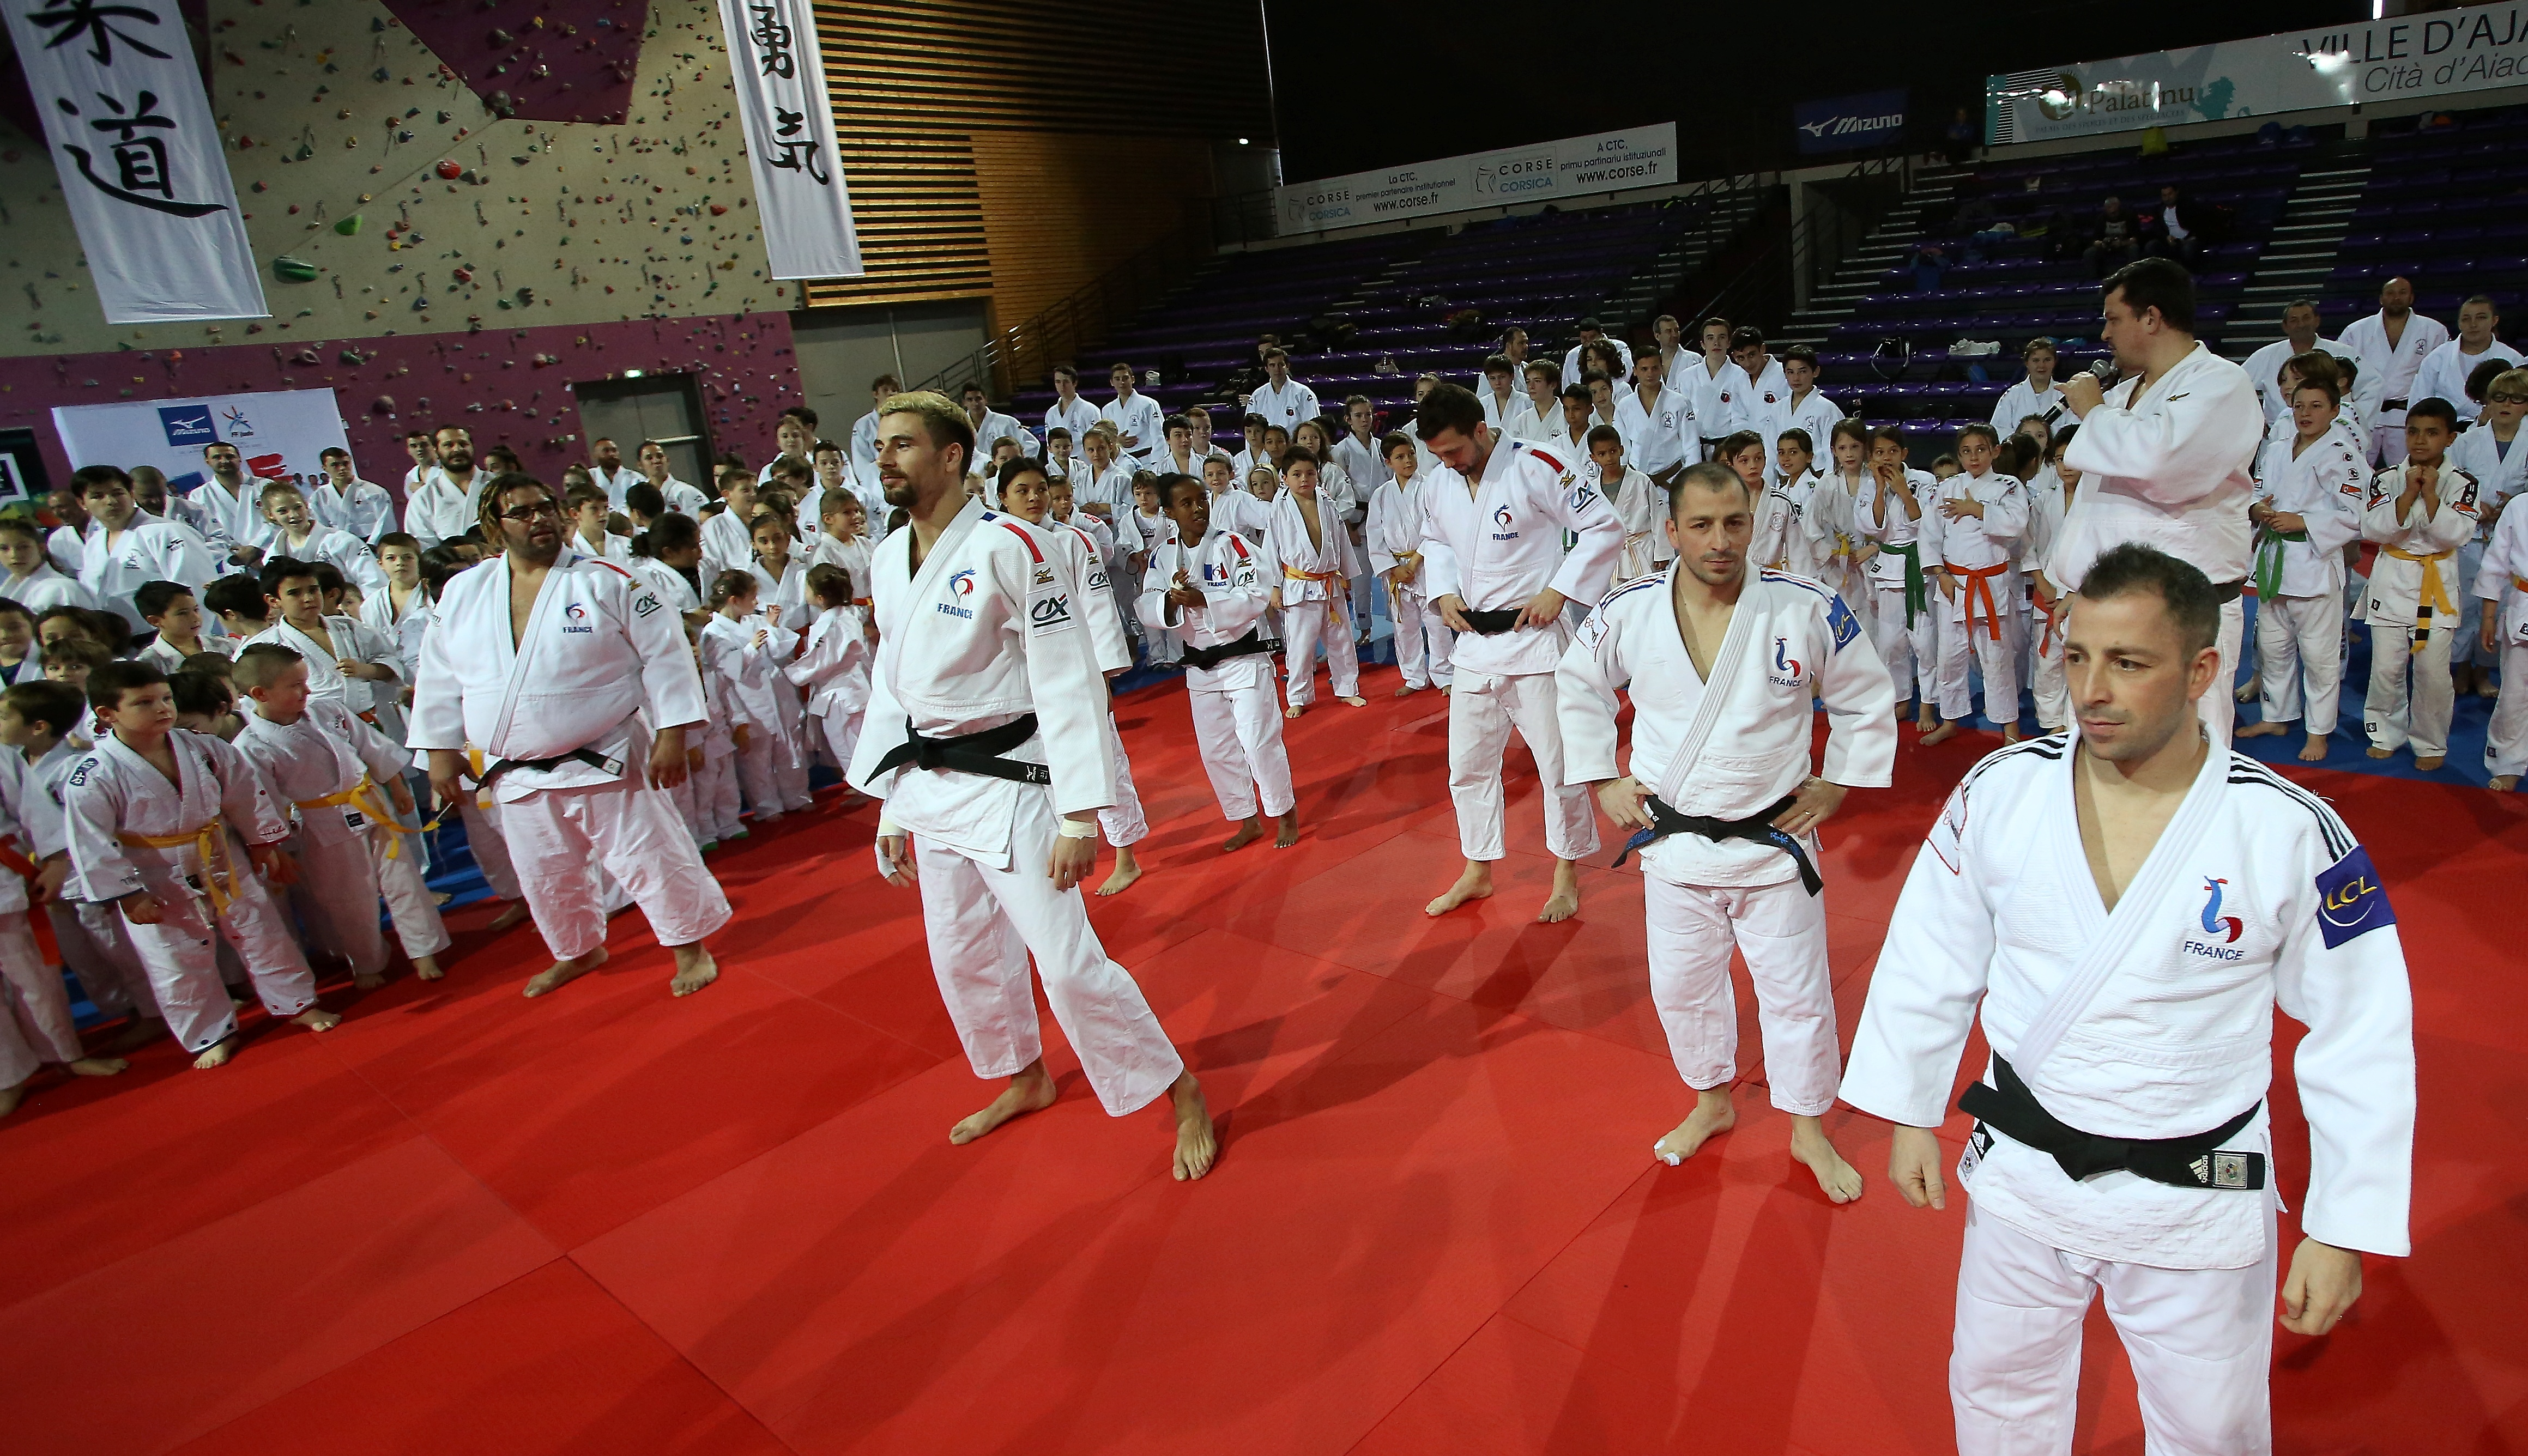 La grande fête du judo au Palatinu